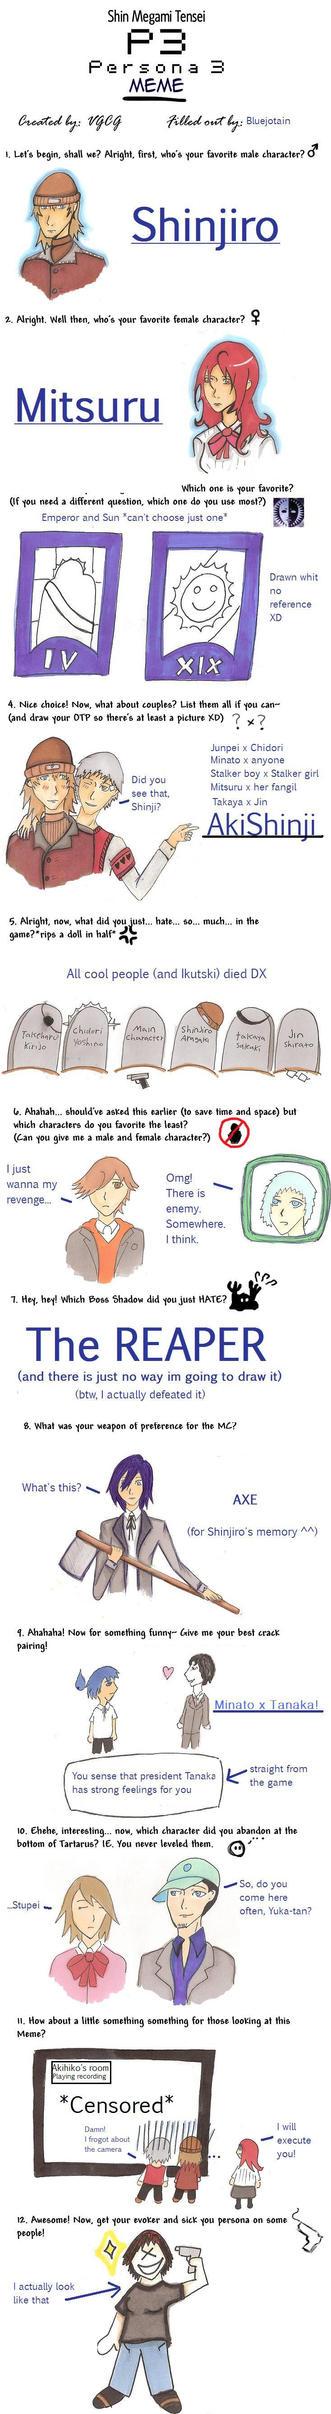 Persona 3 meme by Bluejotain